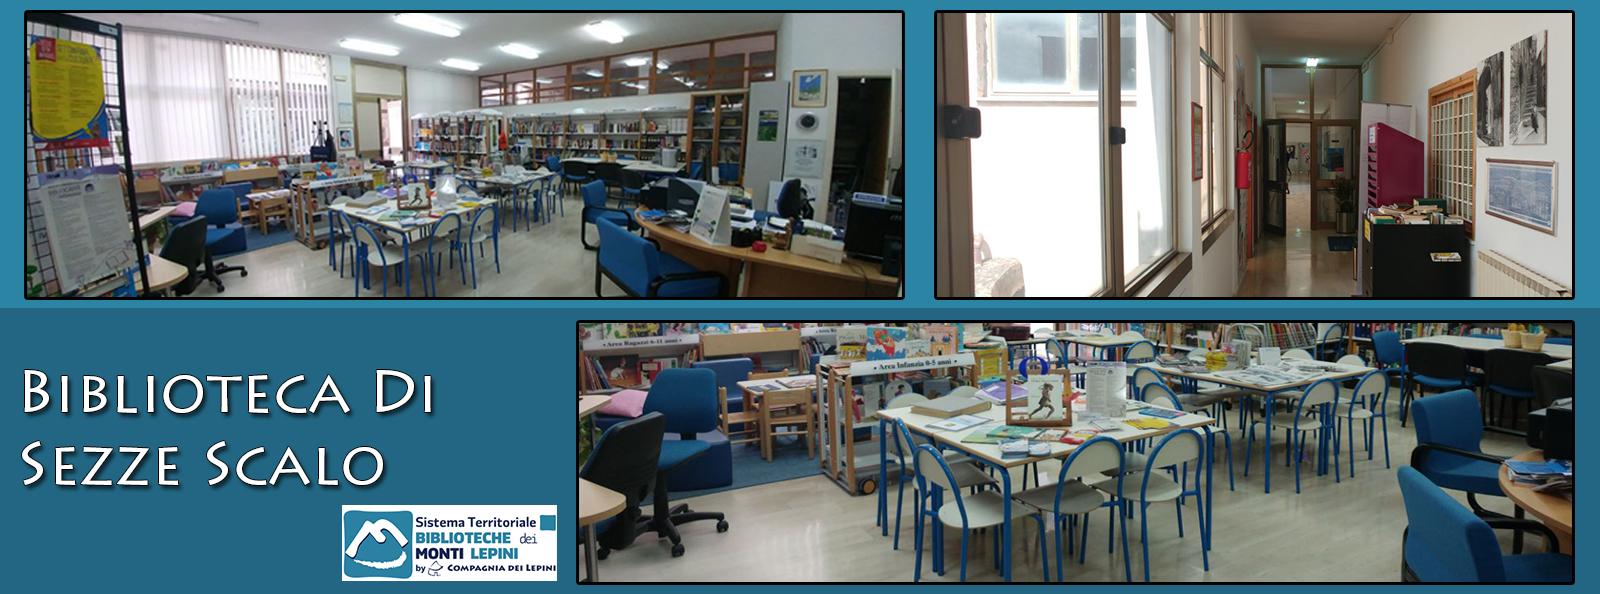 Sezze Scalo - Biblioteca Comunale